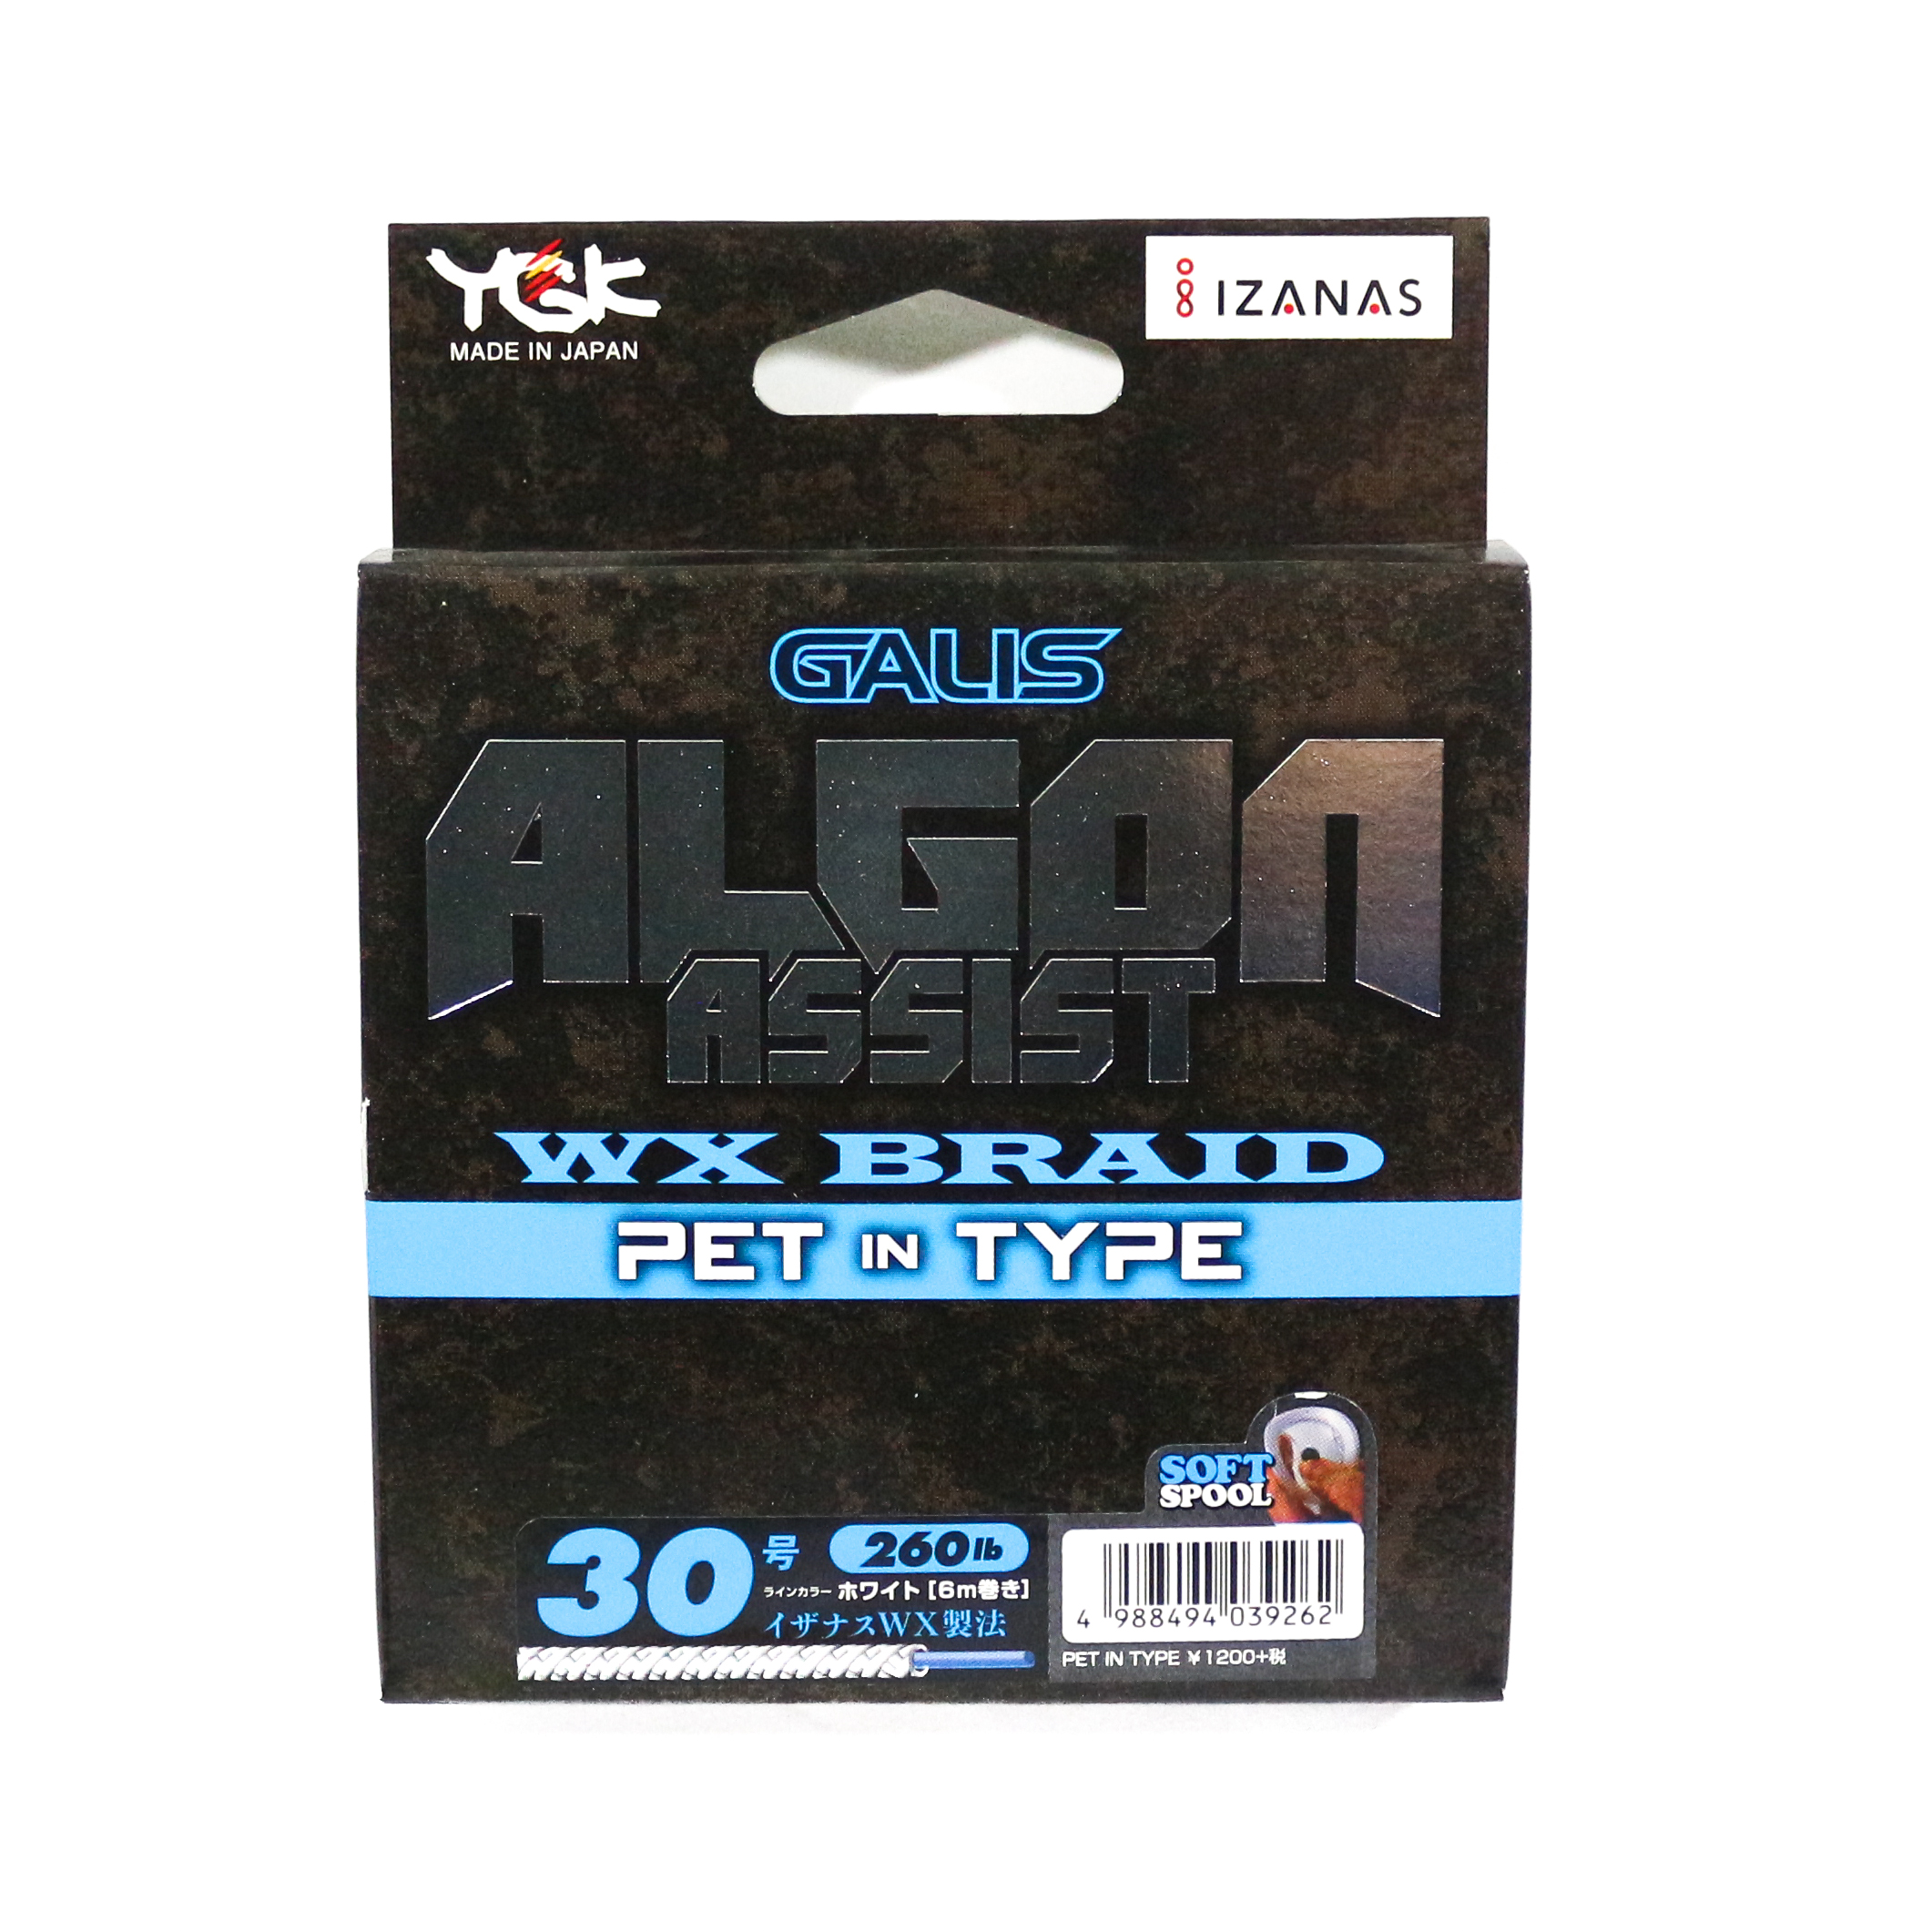 YGK Algon Assist WX Braid PET in Type 6m Size 30, 260lb White (9262)